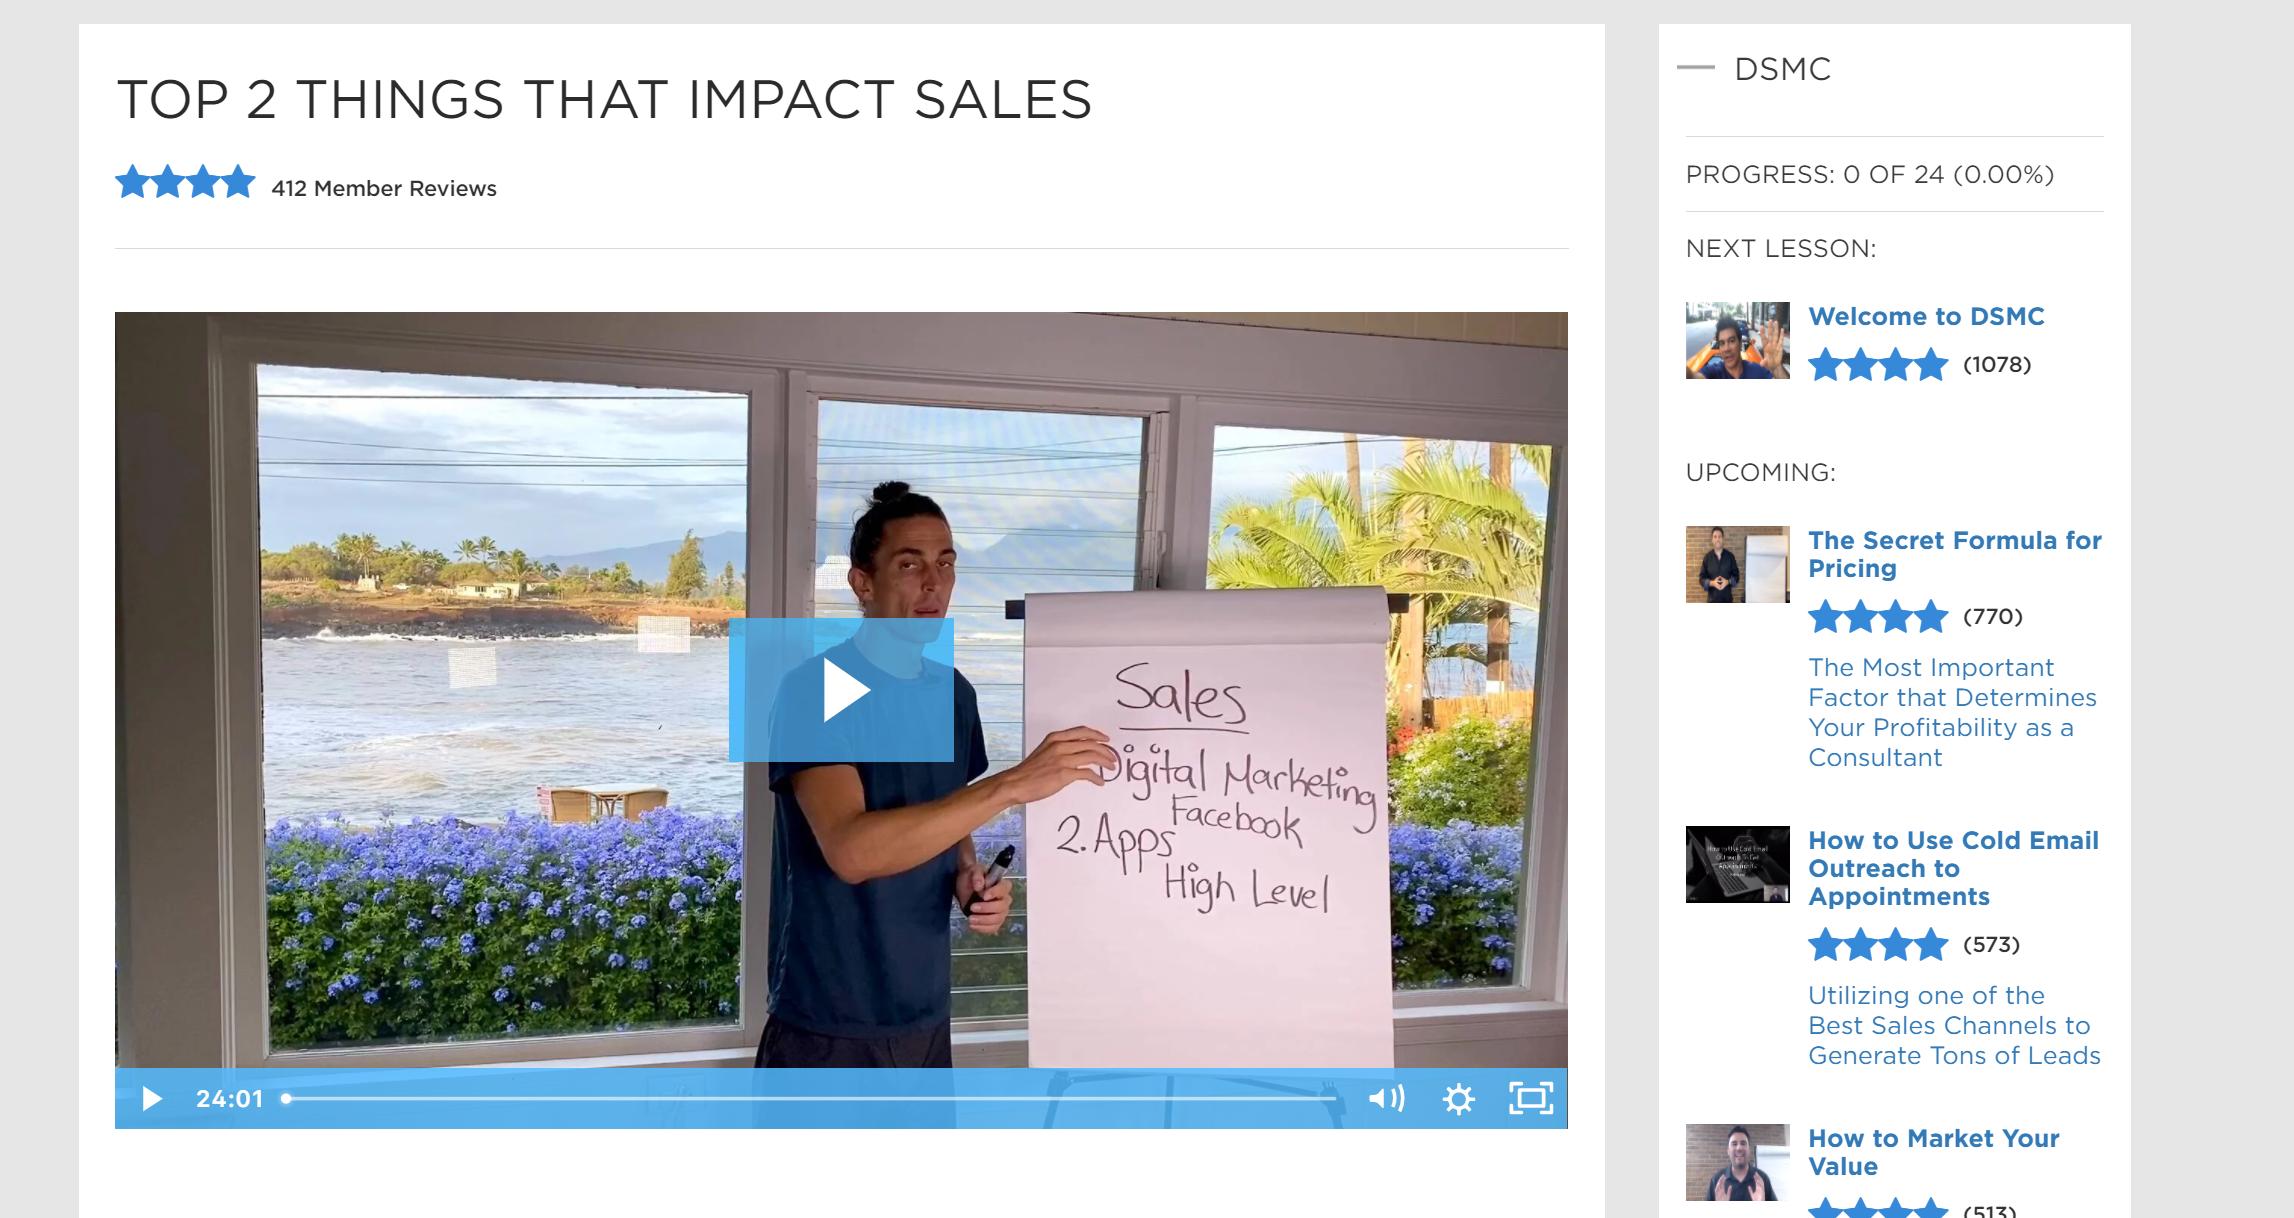 tai lopez impact sales